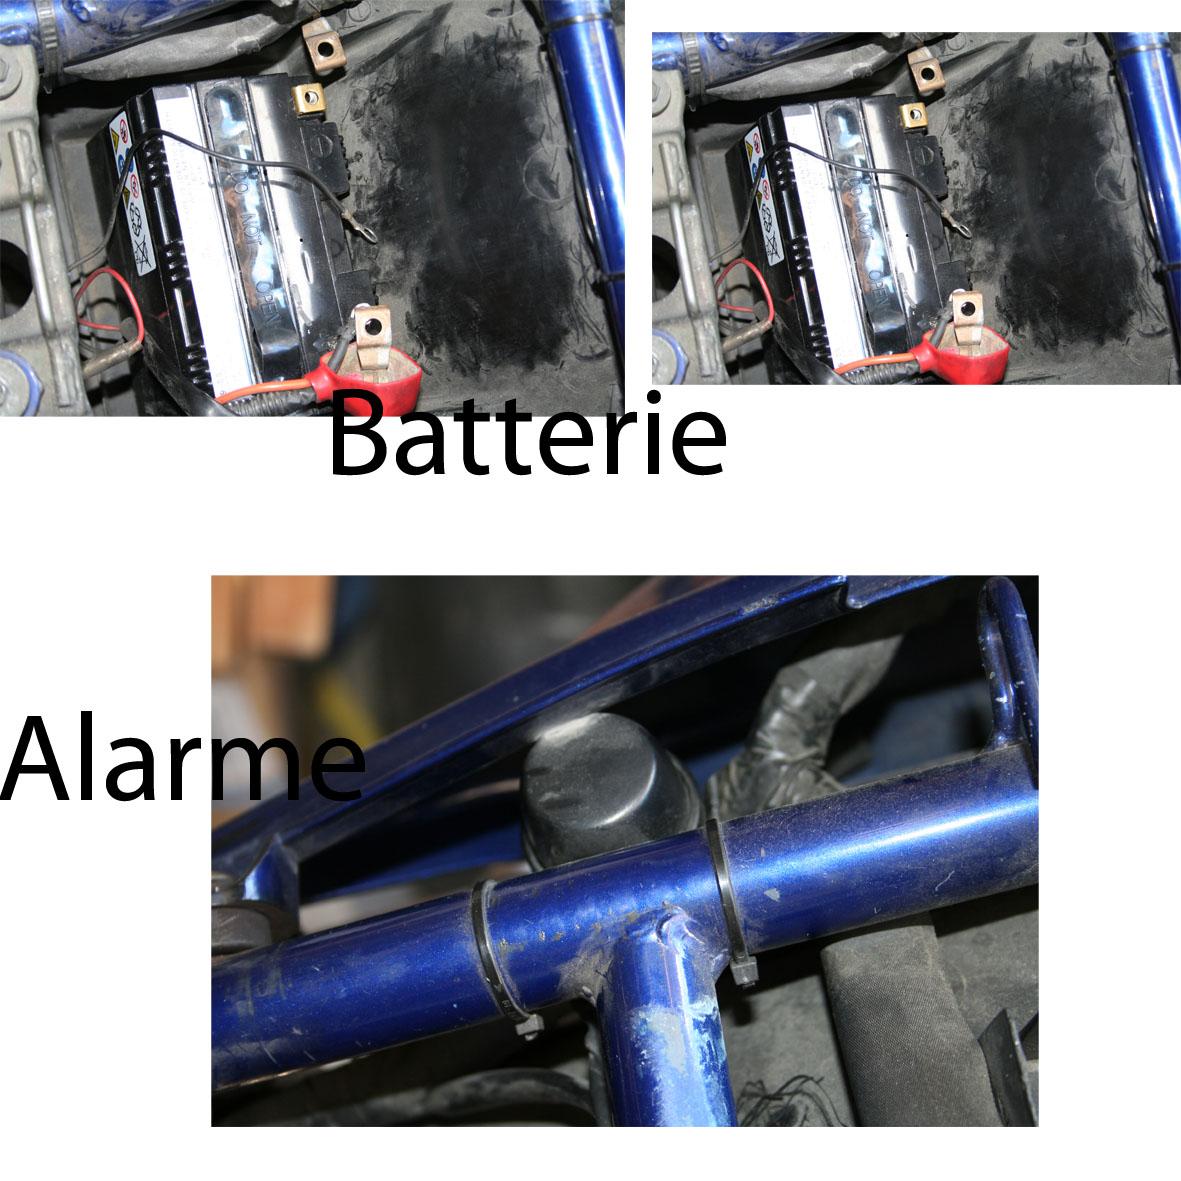 batterie moto 600 bandit